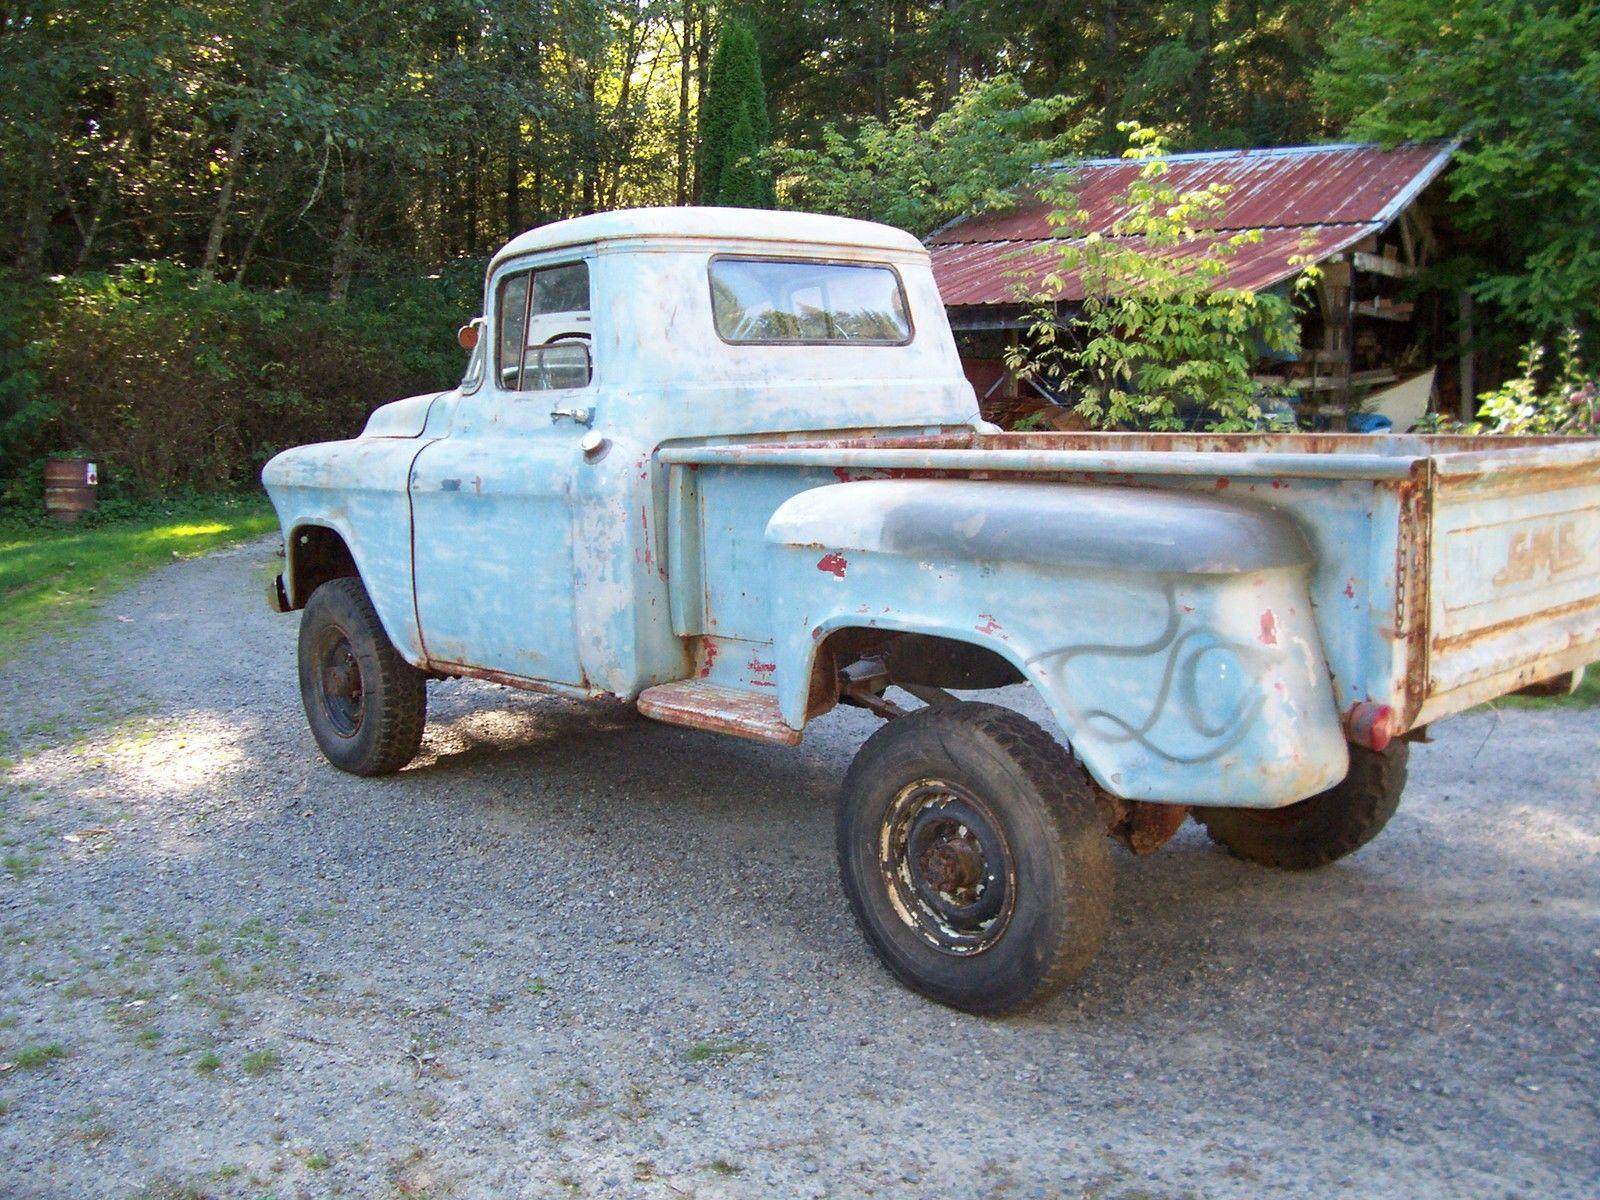 1956 GMC 1/2 ton with napco project like apache - Classic